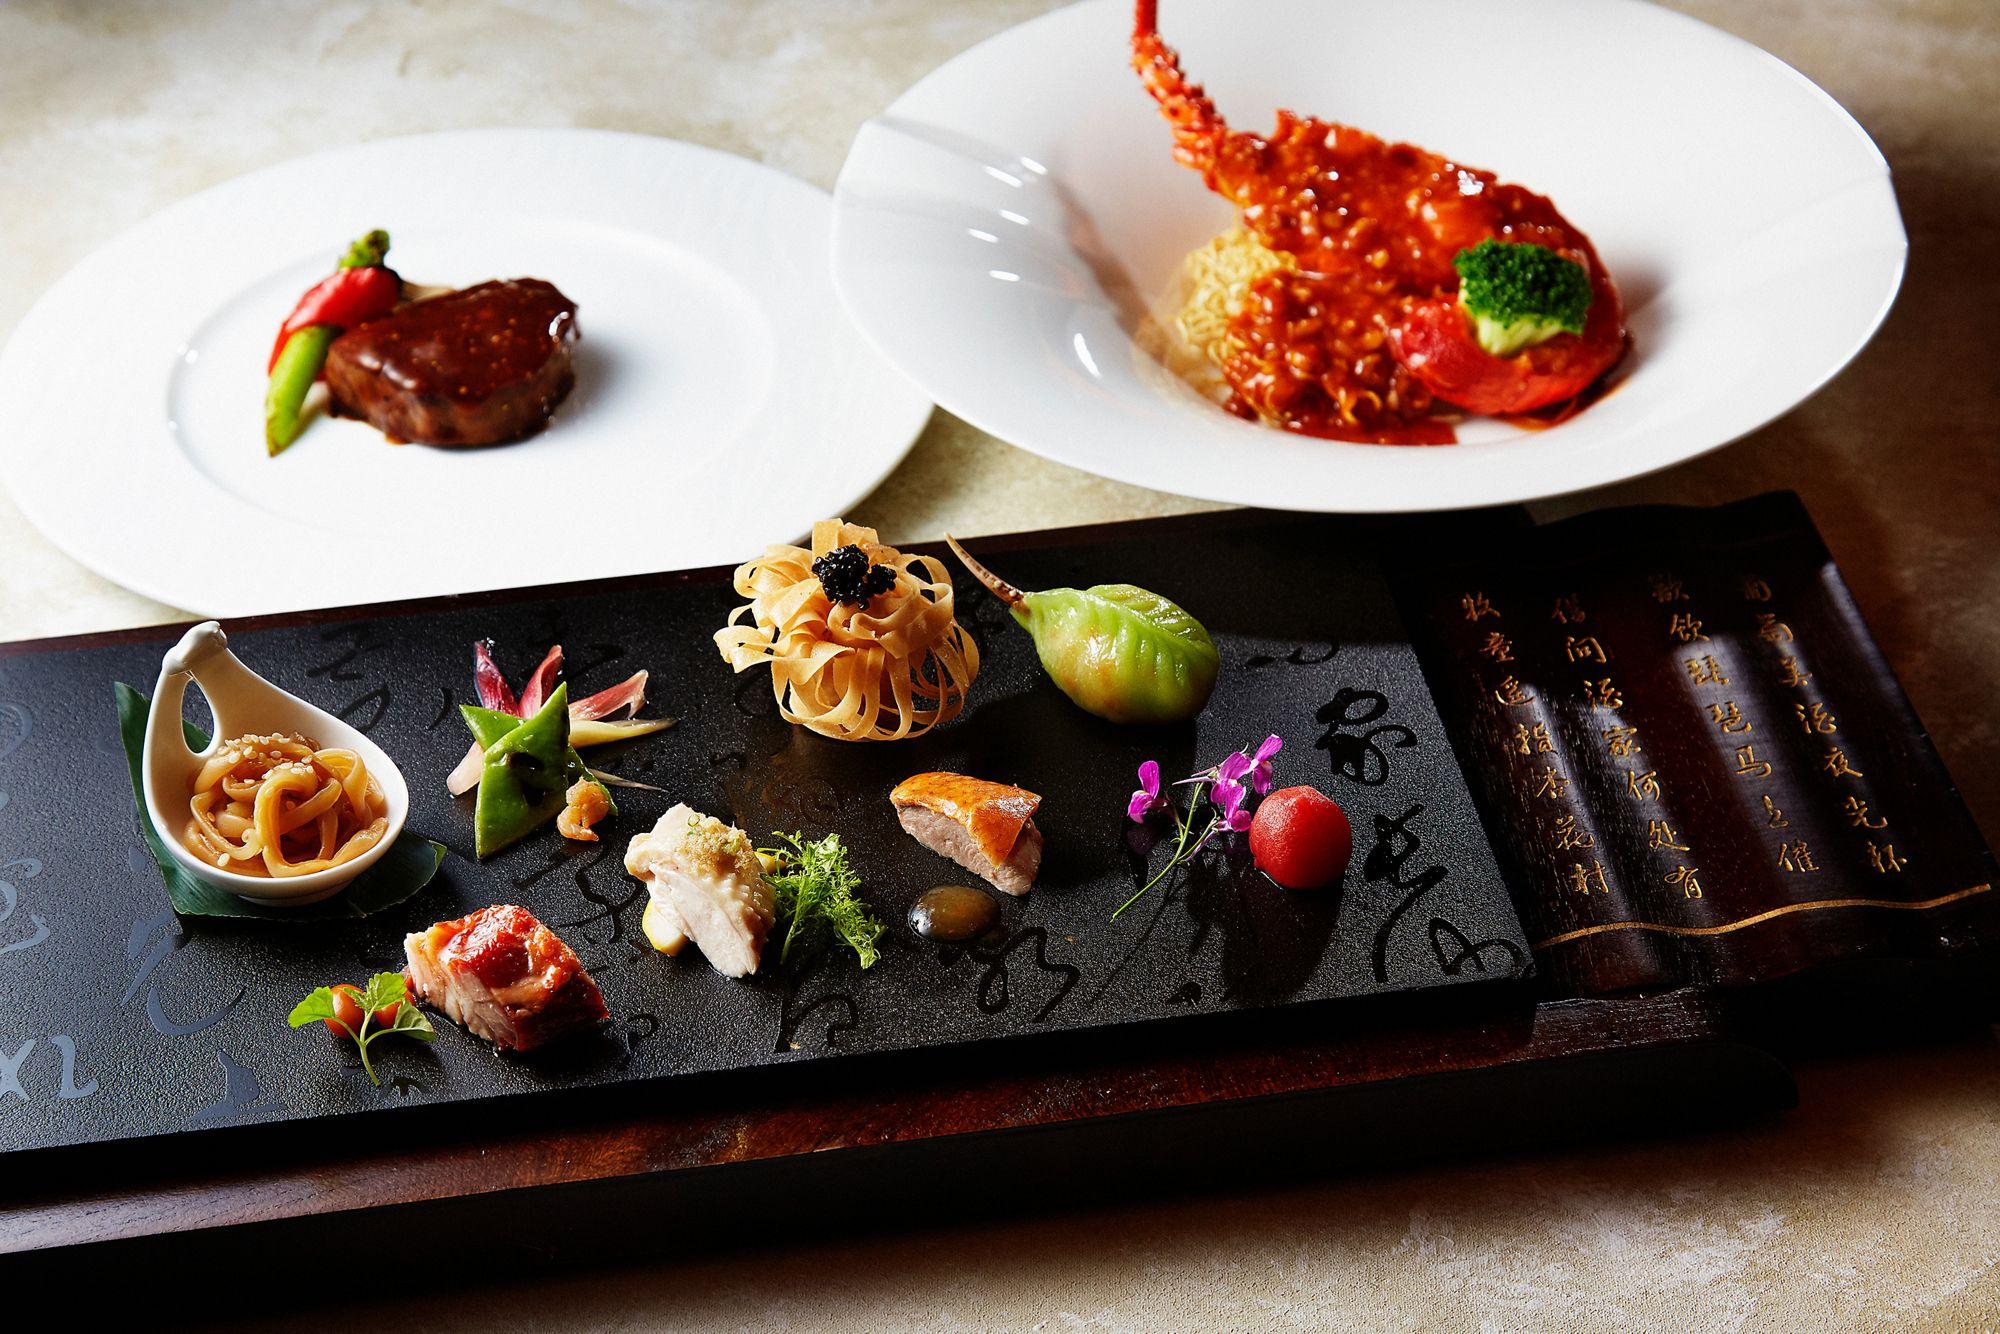 Xiang Tao Premium Dinner